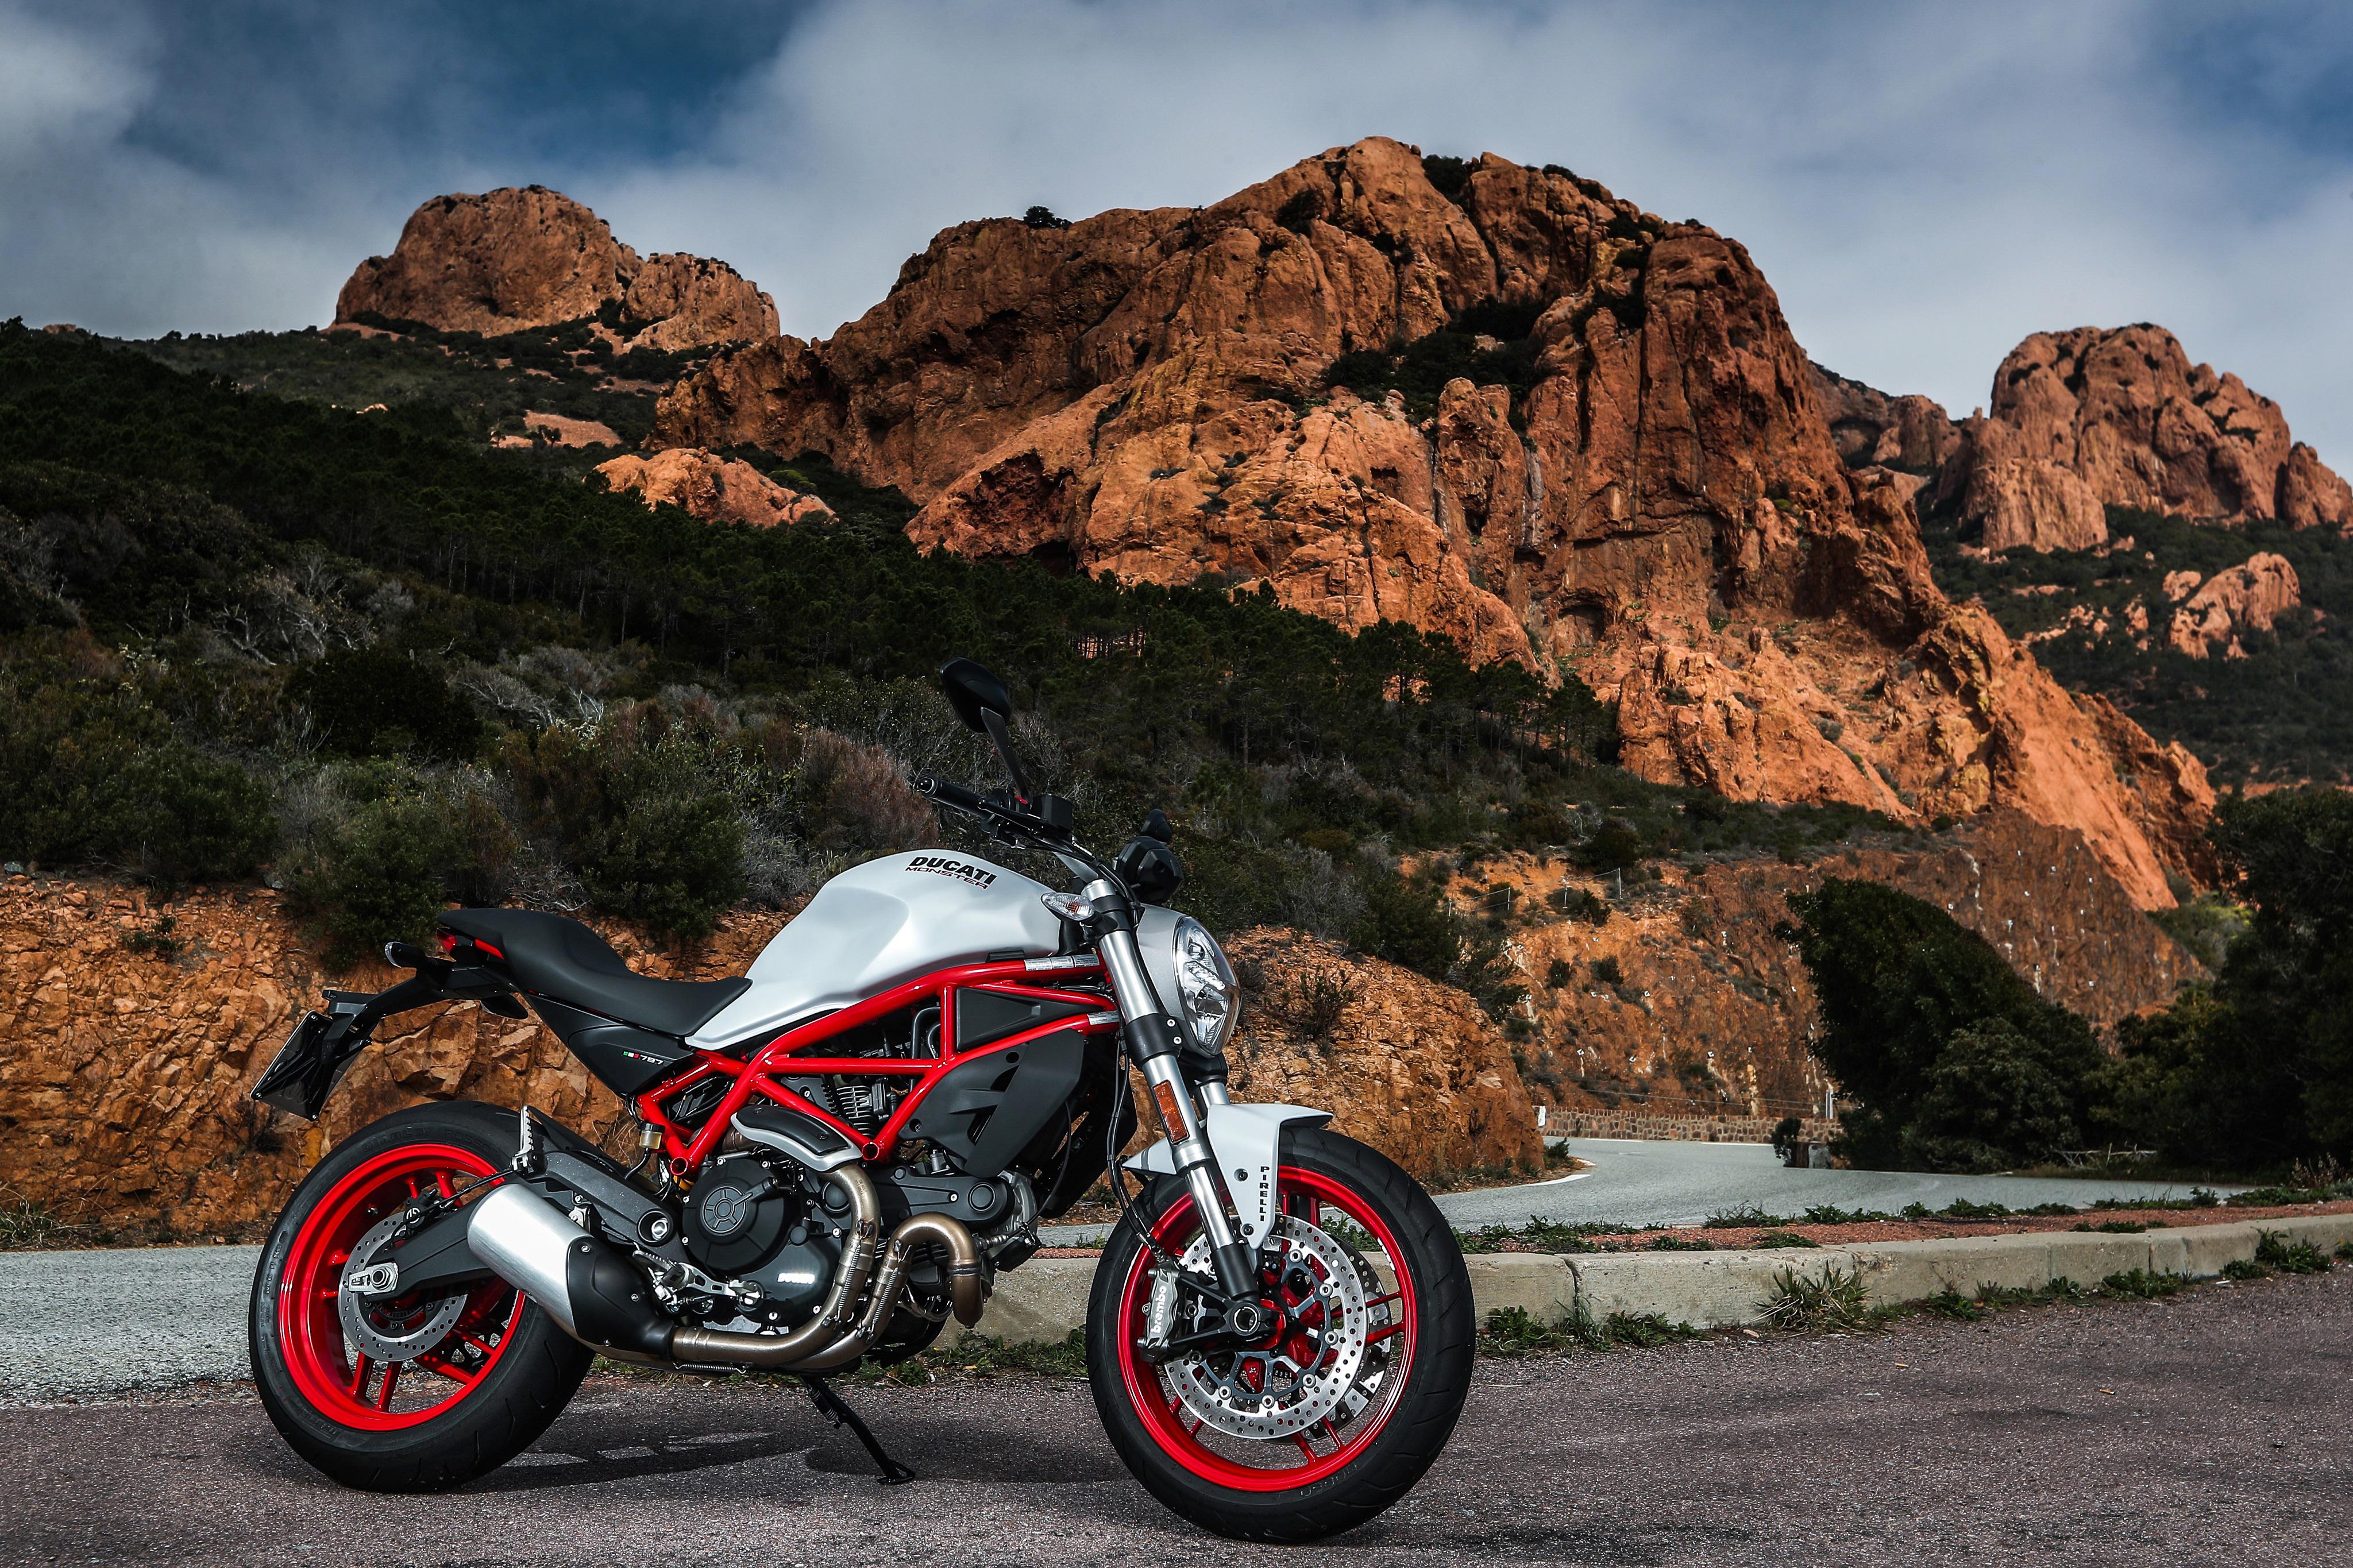 Ducati Monster 4k Ultra HD Wallpaper